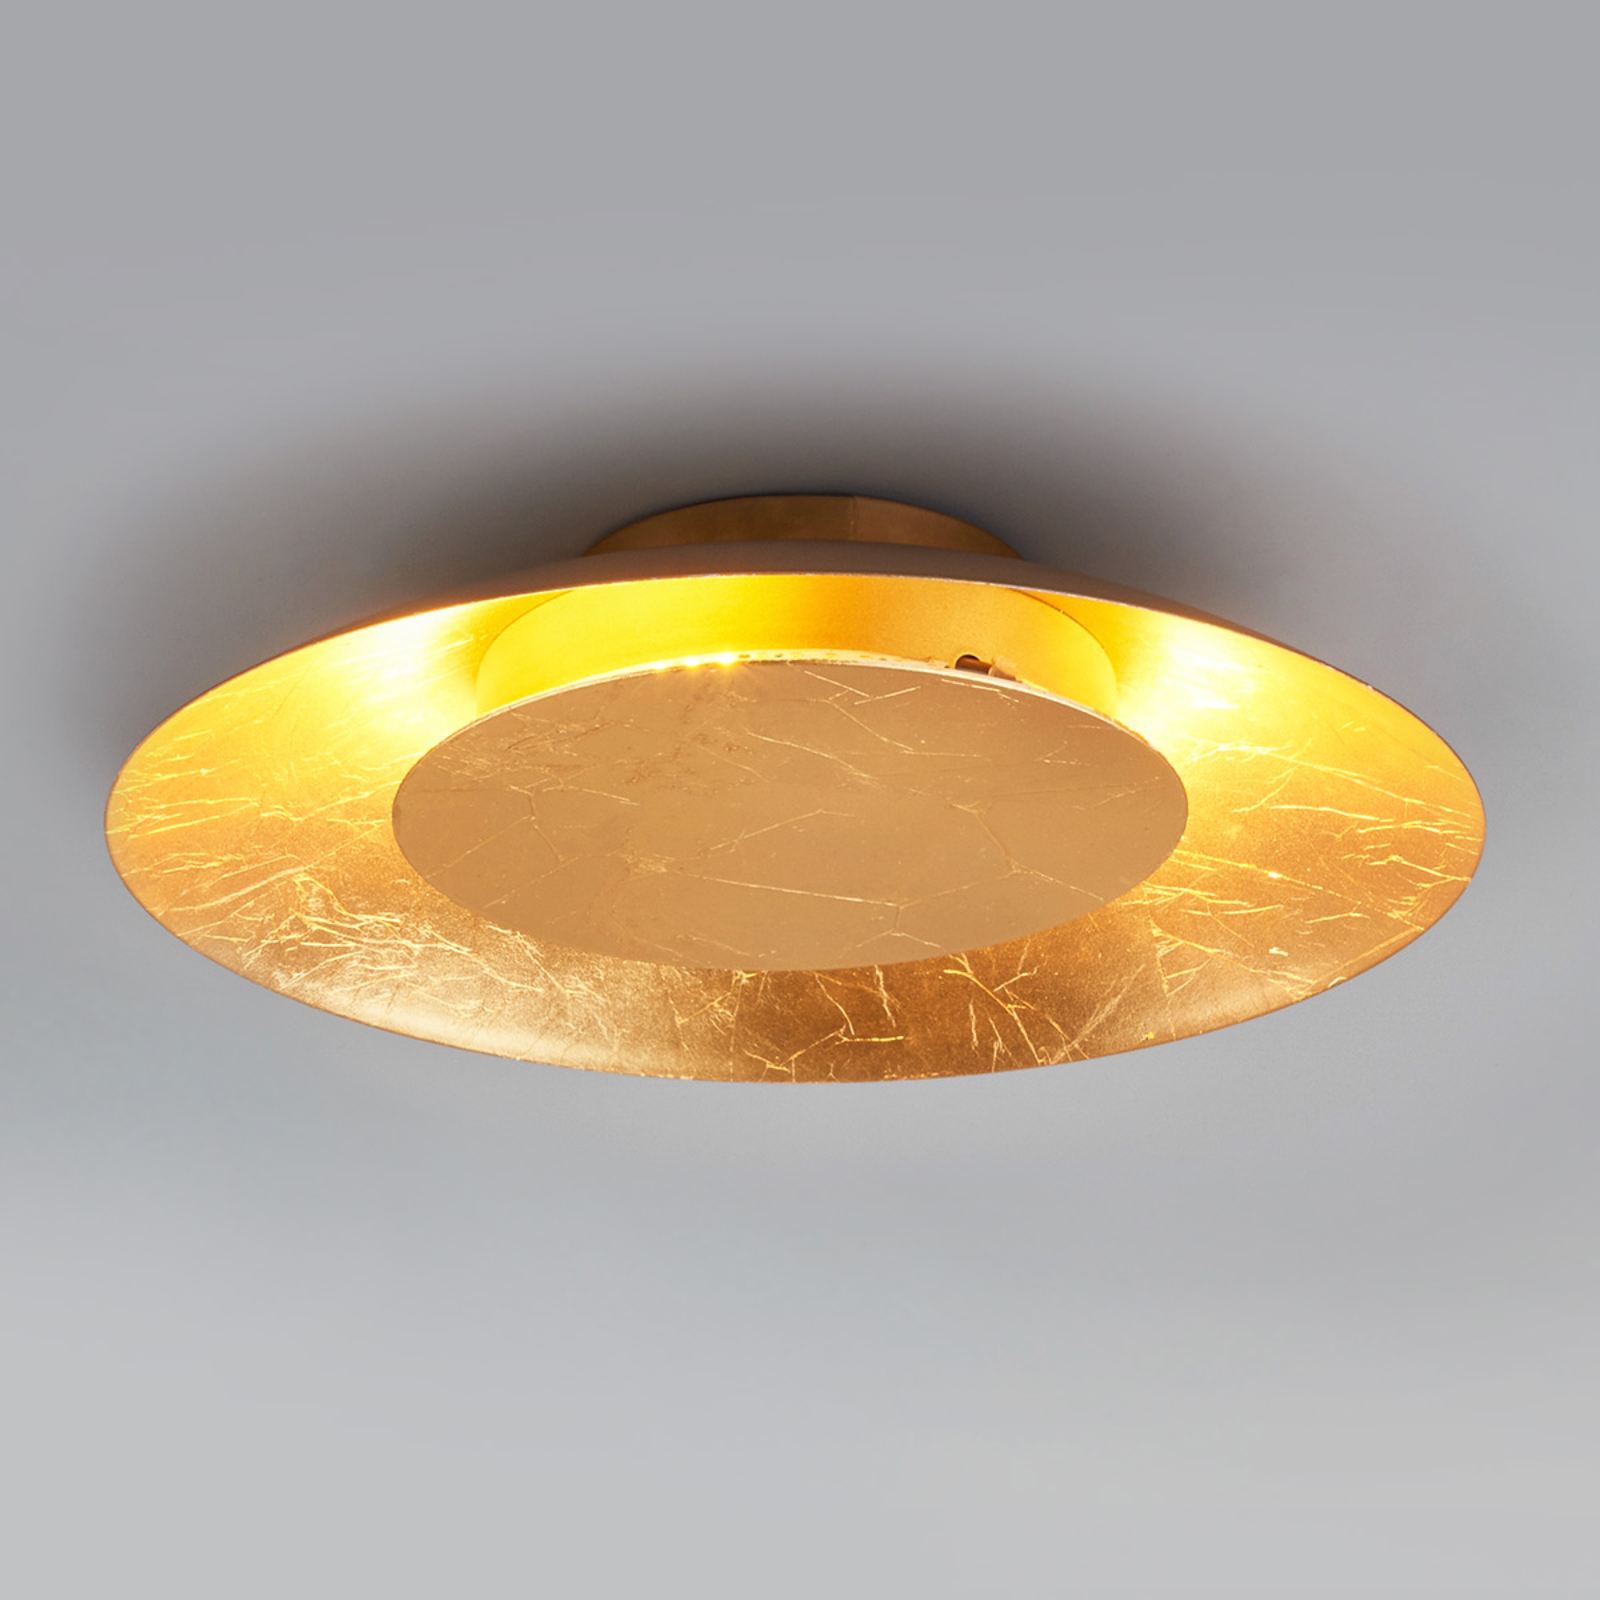 LED-taklampa Keti, guldlook, Ø 34,5 cm